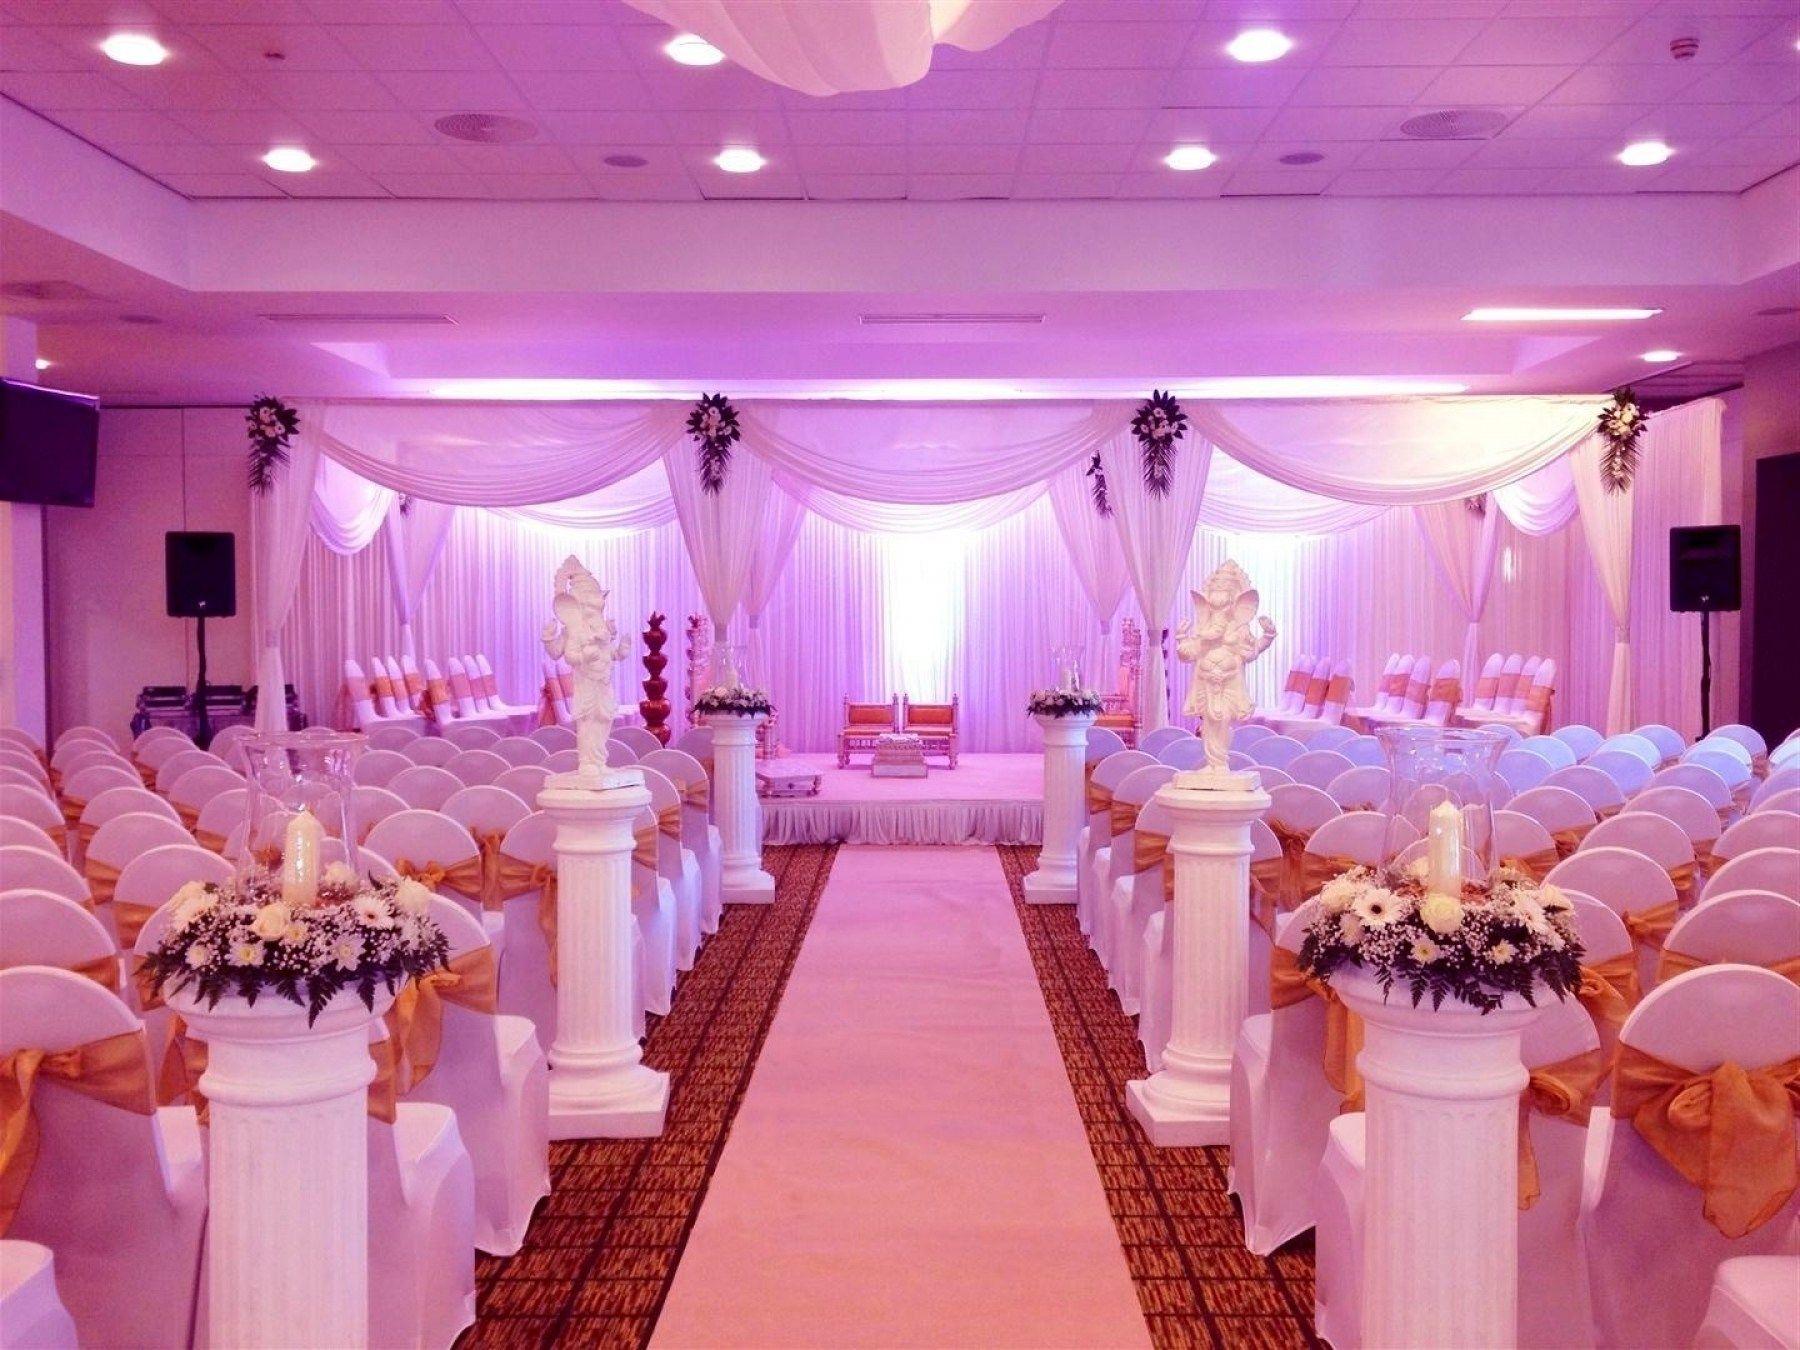 30 Best Purple And Pink Wedding Decoration Ideas | Pinterest | Pink ...